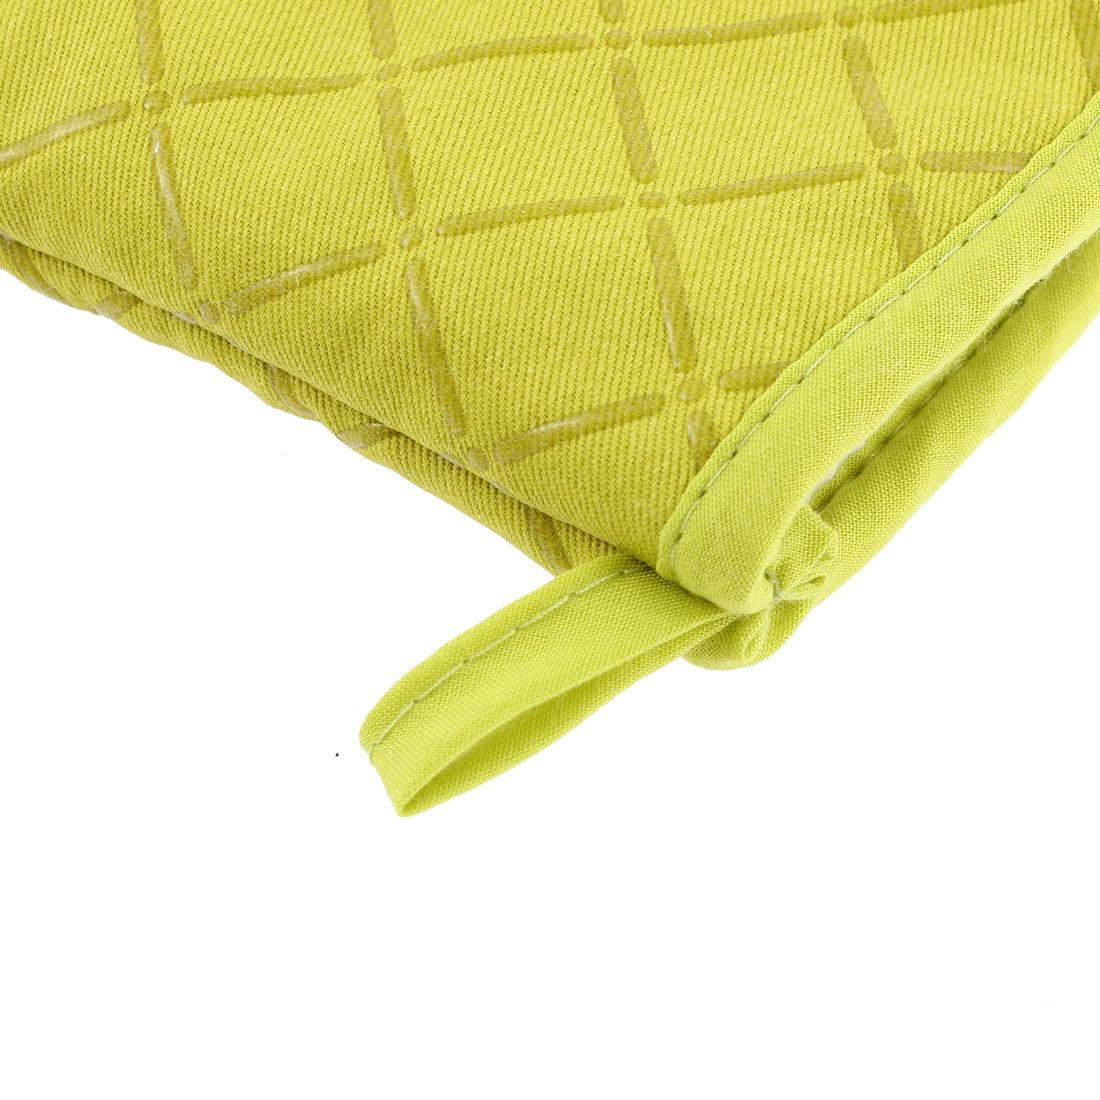 Kitchen Microwave Baking Cross Pattern Heat Resistance Mitten Glove Green - image 2 of 3